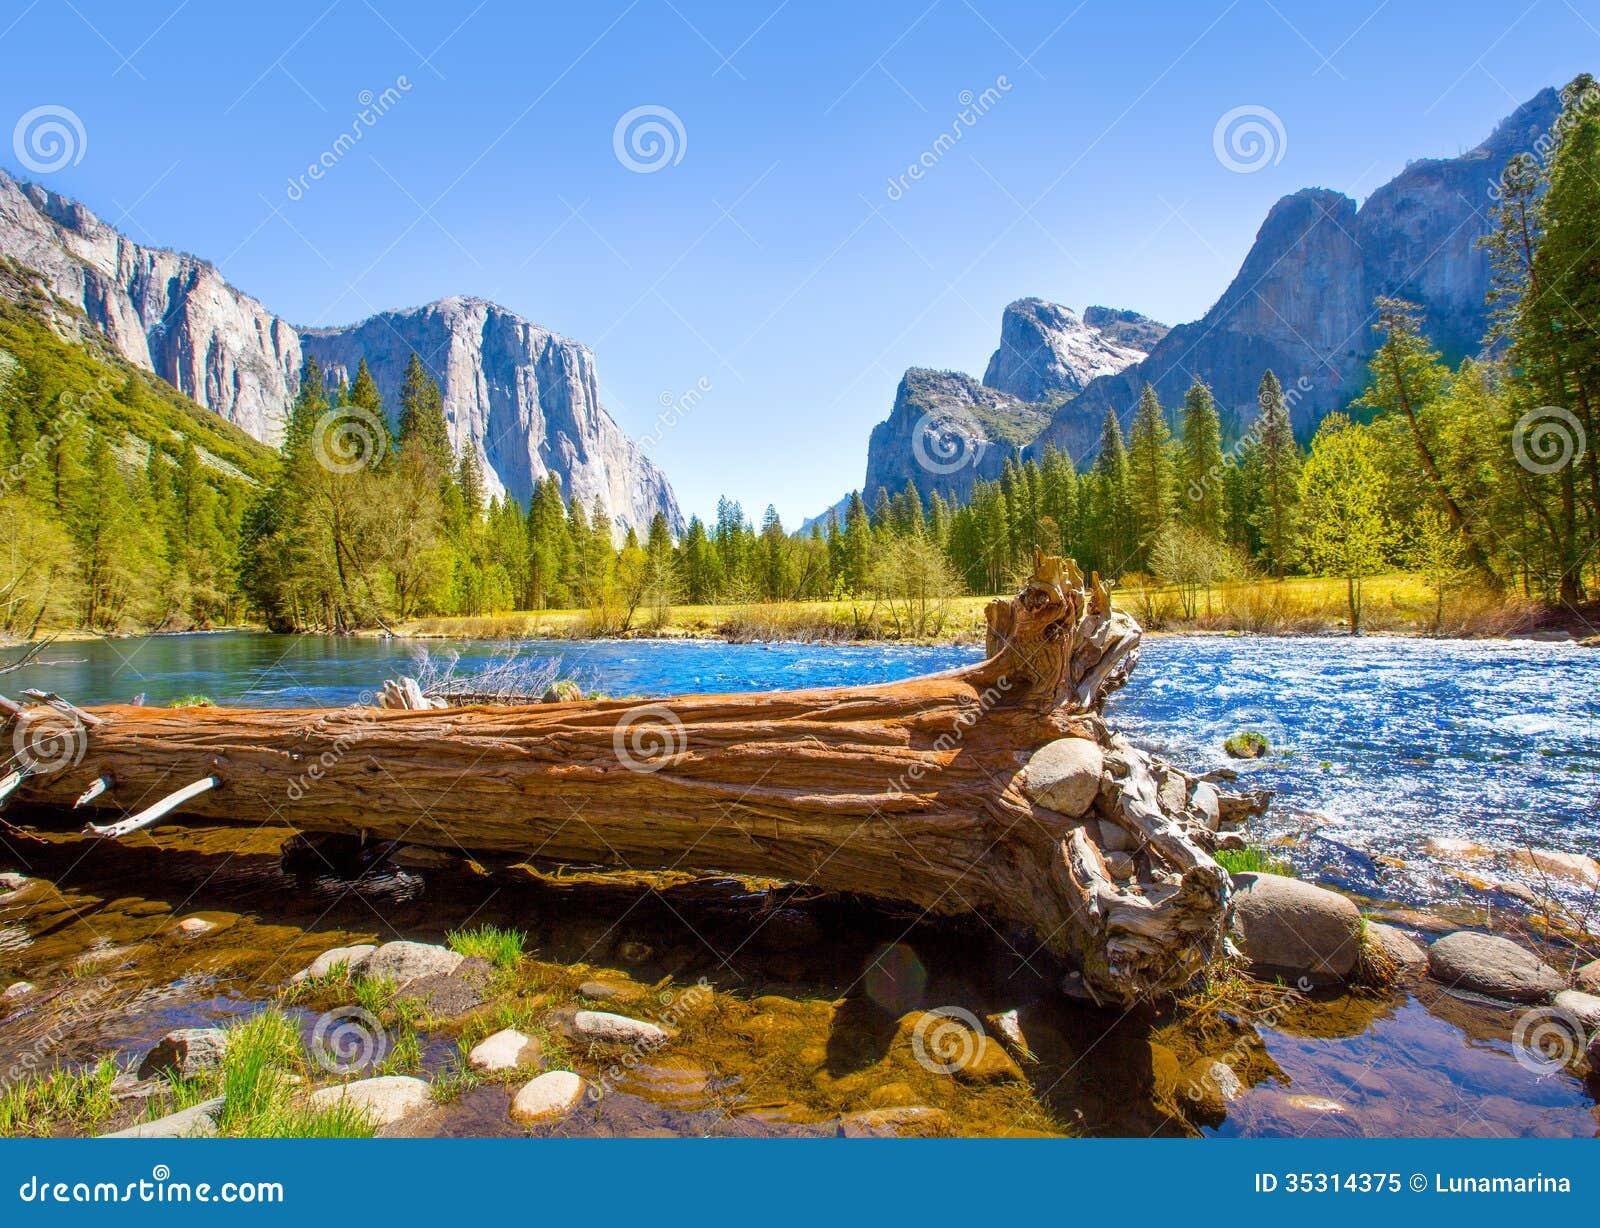 Download Yosemite Merced River El Capitan And Half Dome Stock Image - Image of river, rock: 35314375